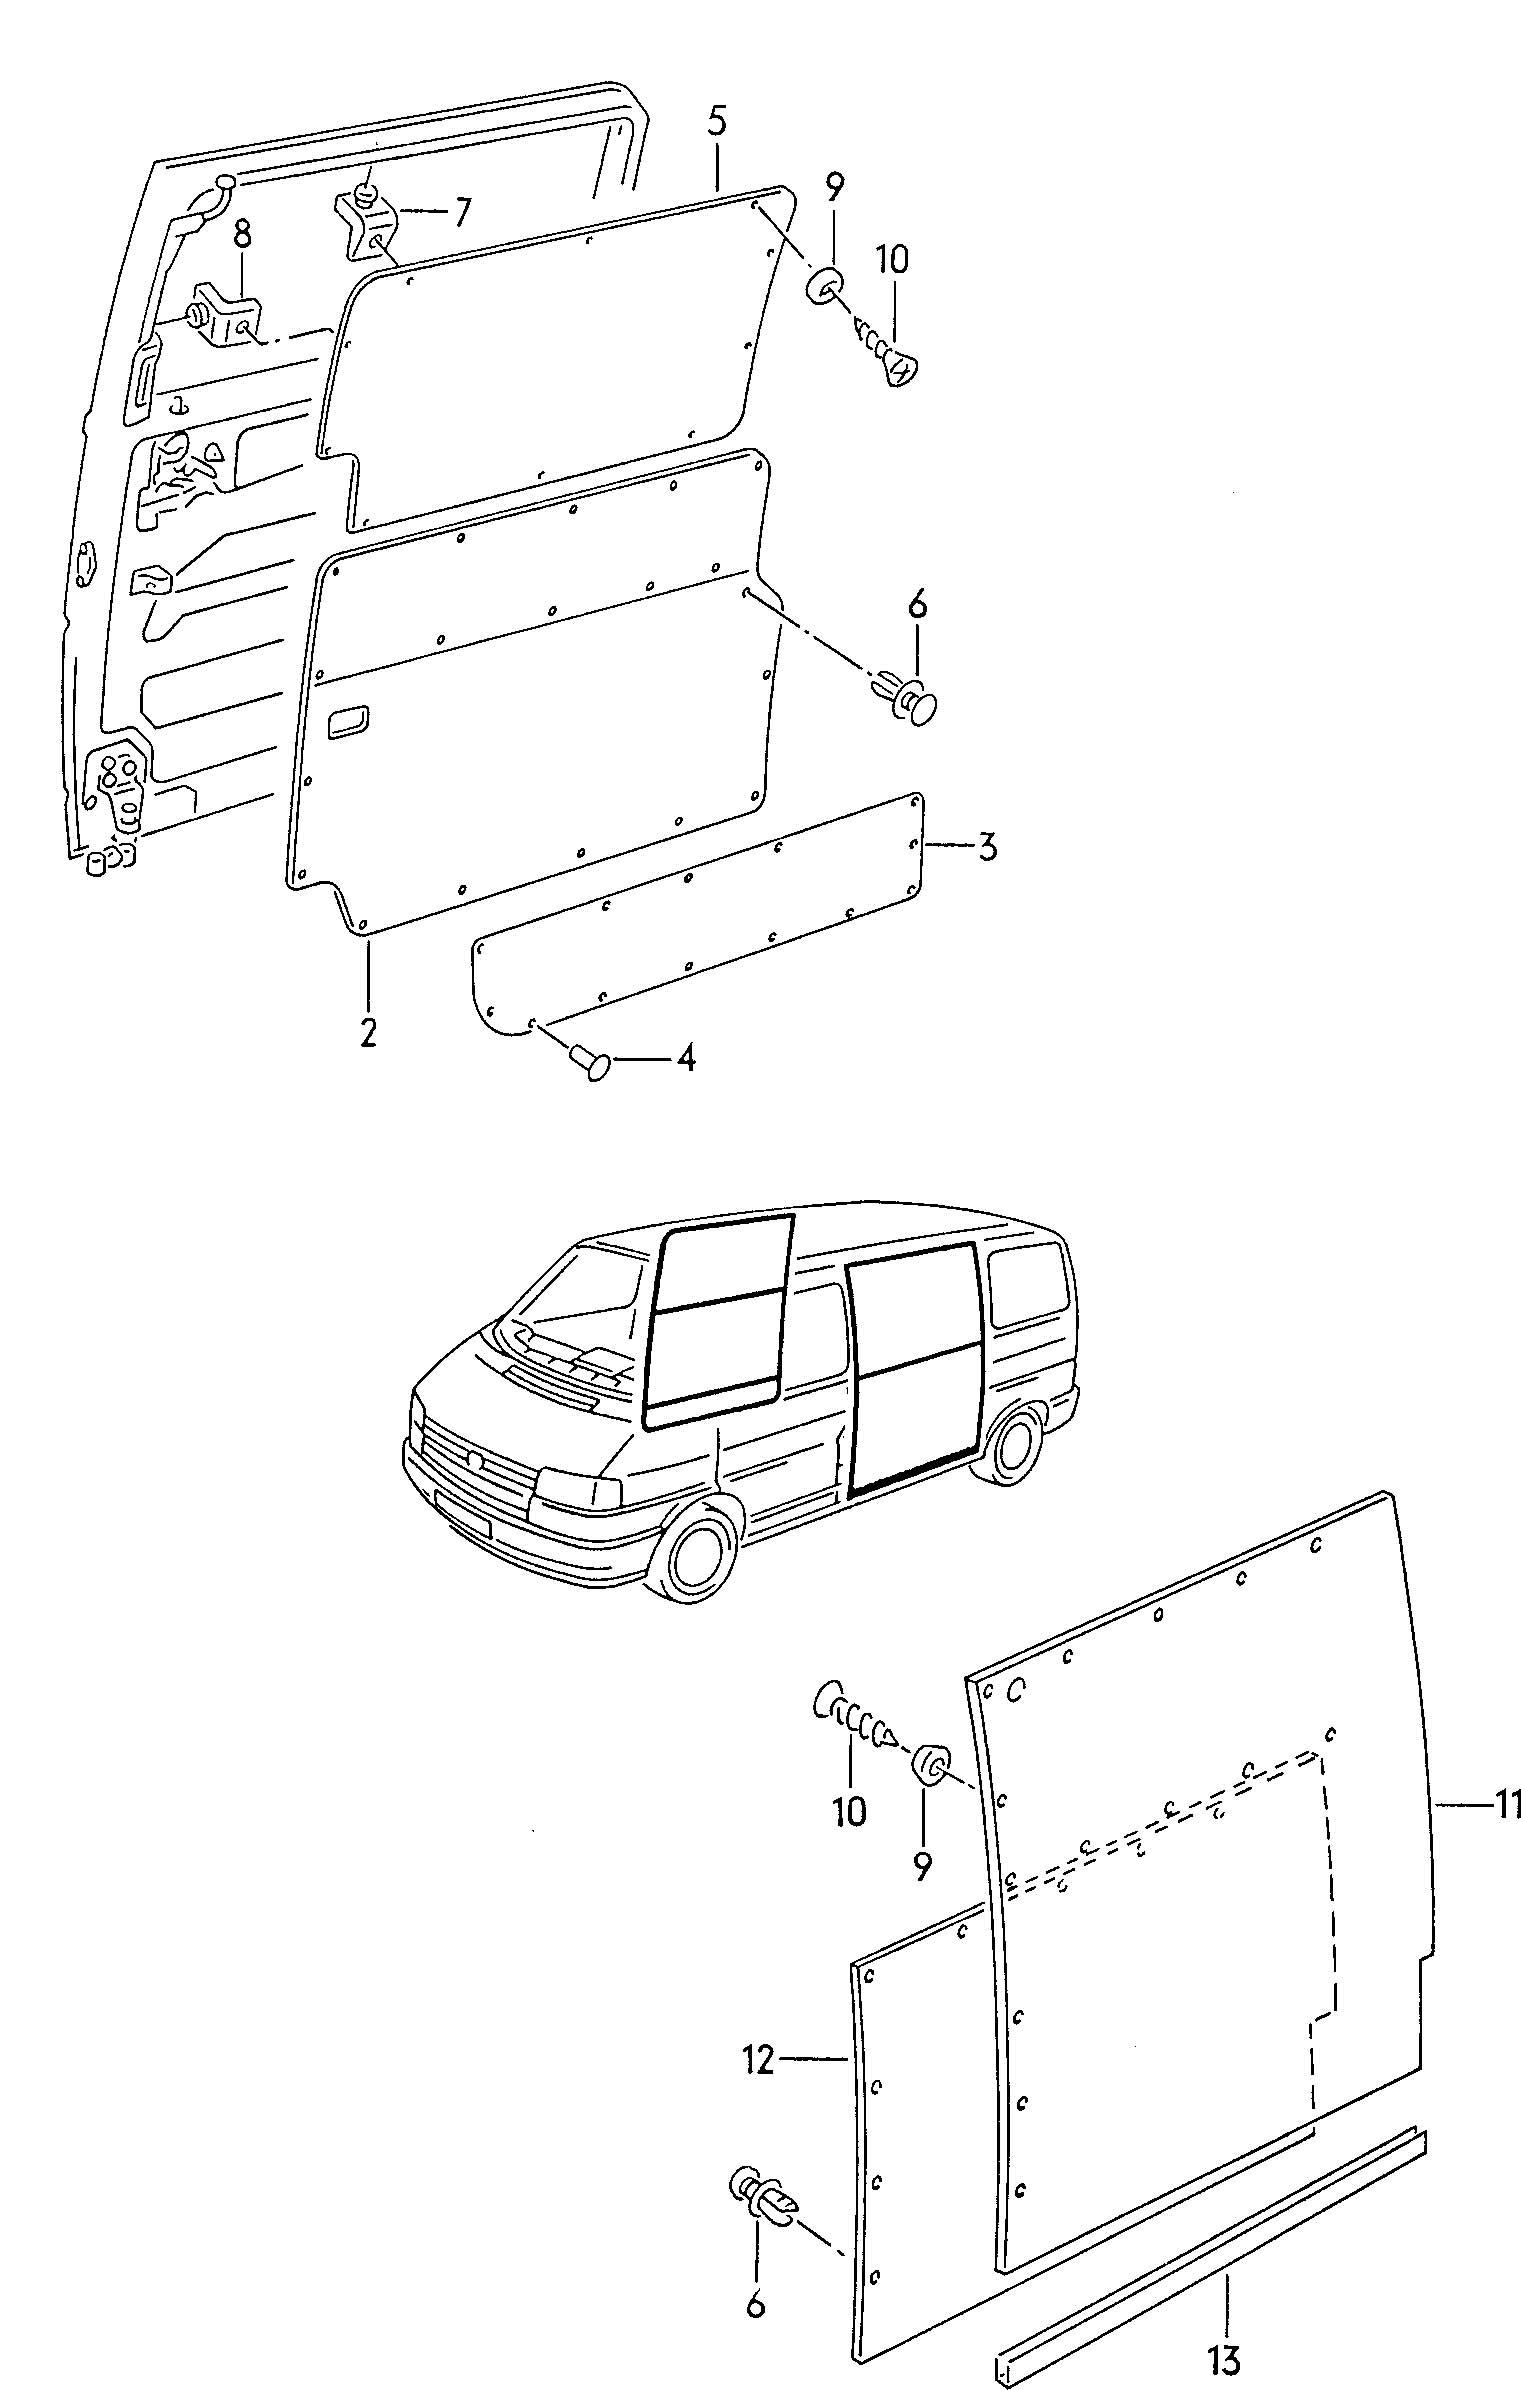 125v receptacle wiring diagrams